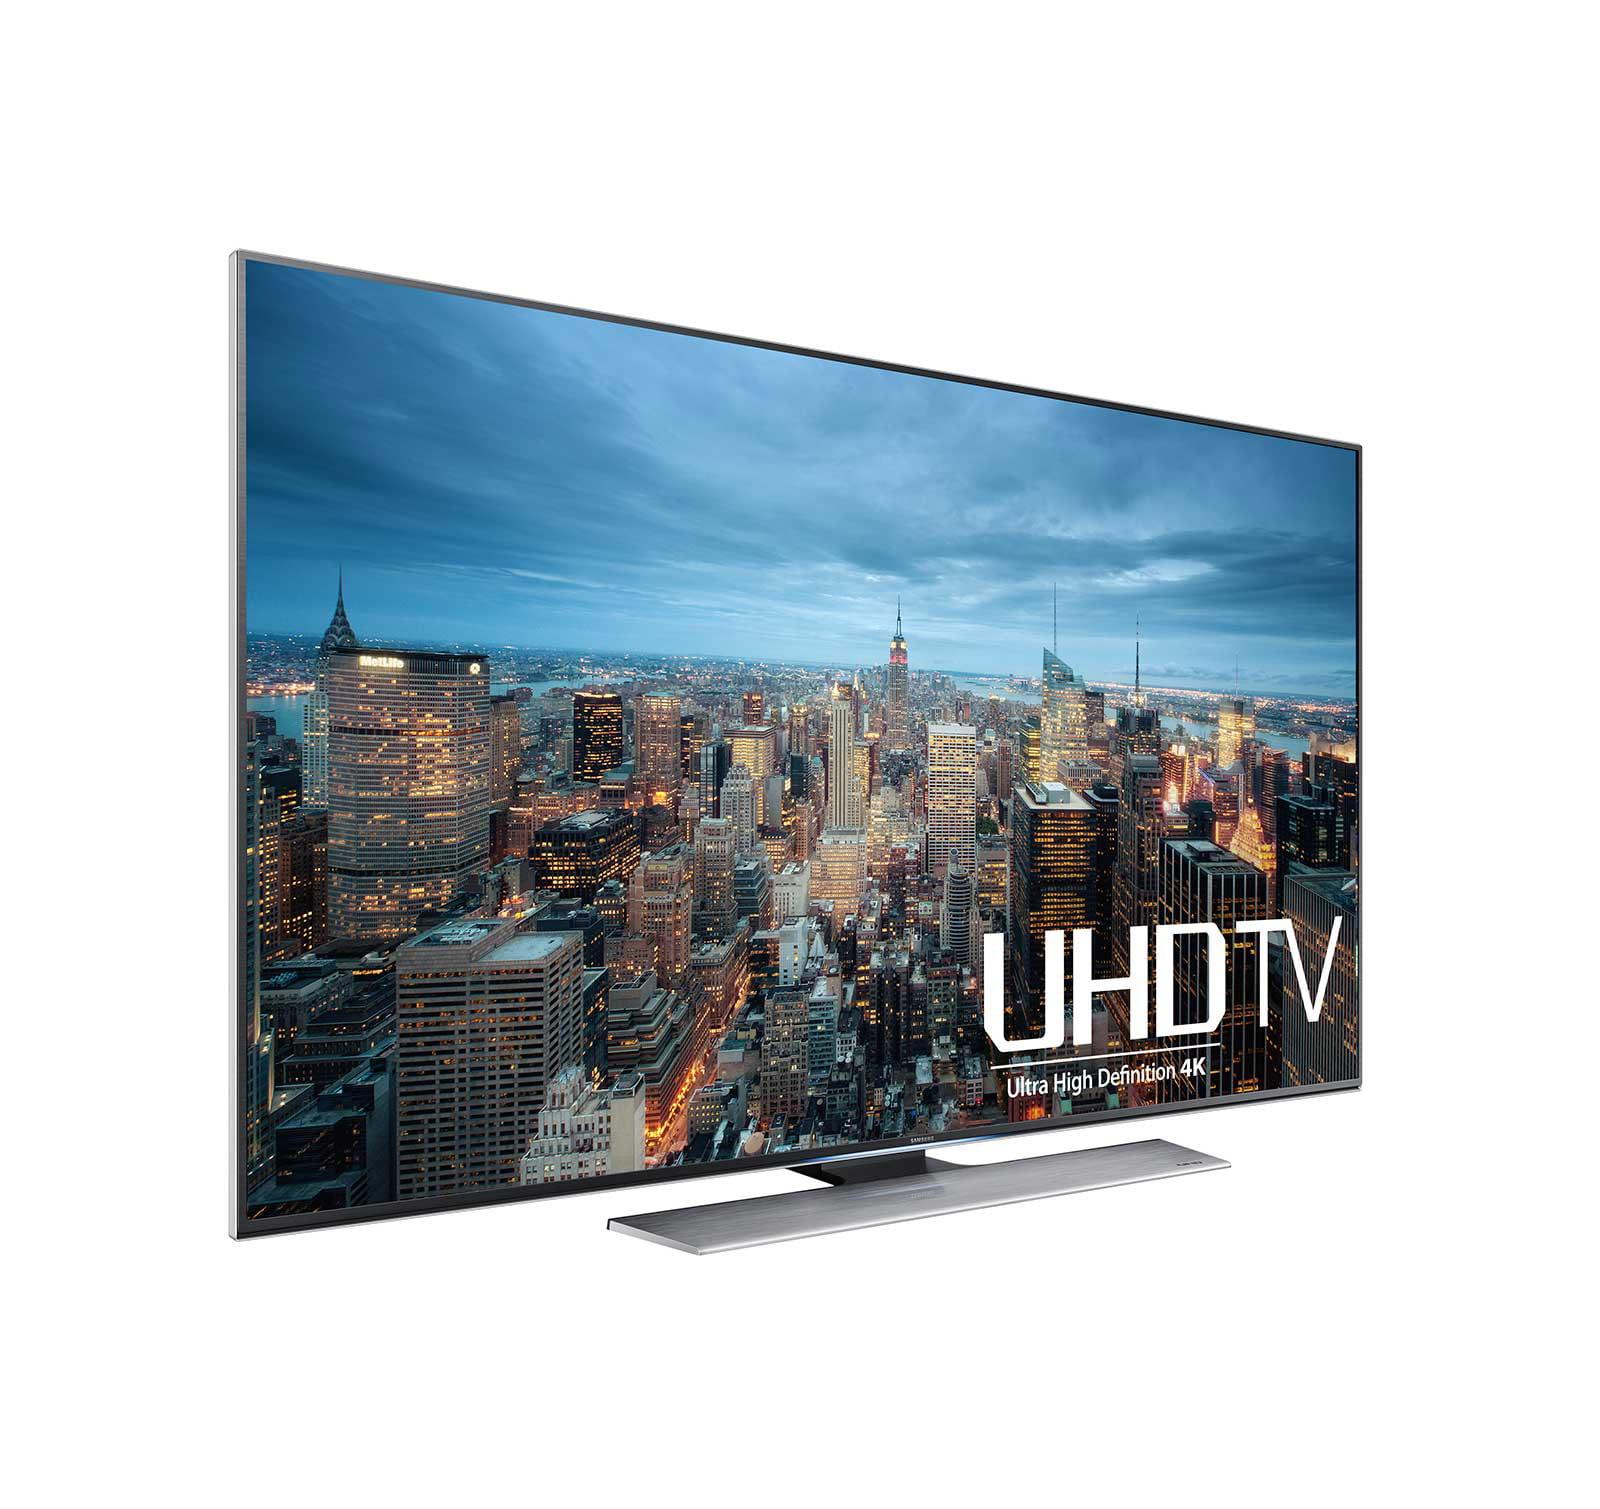 "Image of Samsung UN85JU7100 85"" 4K Ultra HD 2160p 120Hz LED LCD Smart HDTV (4K x 2K)"